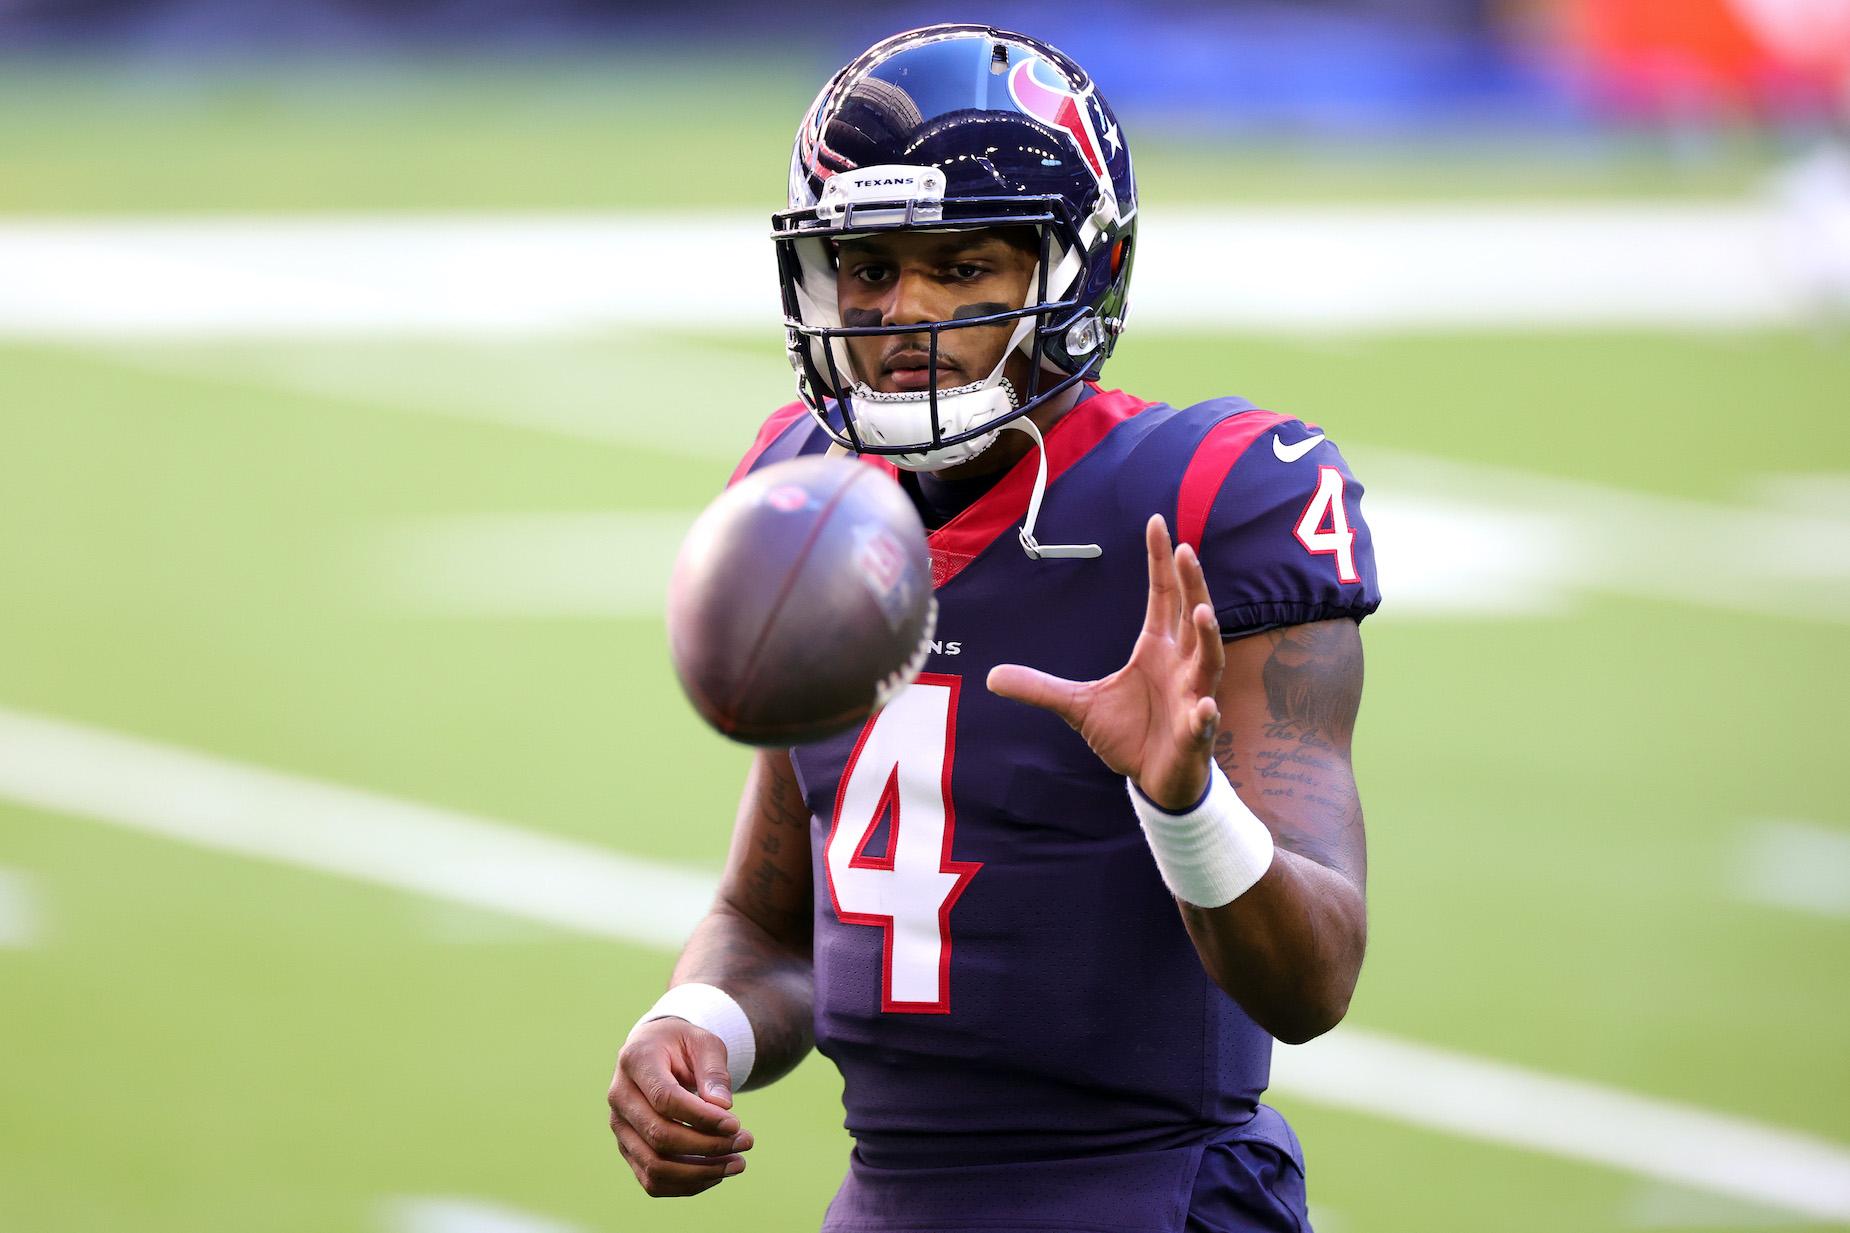 Houston Texans quarterback Deshaun Watson in NFL action